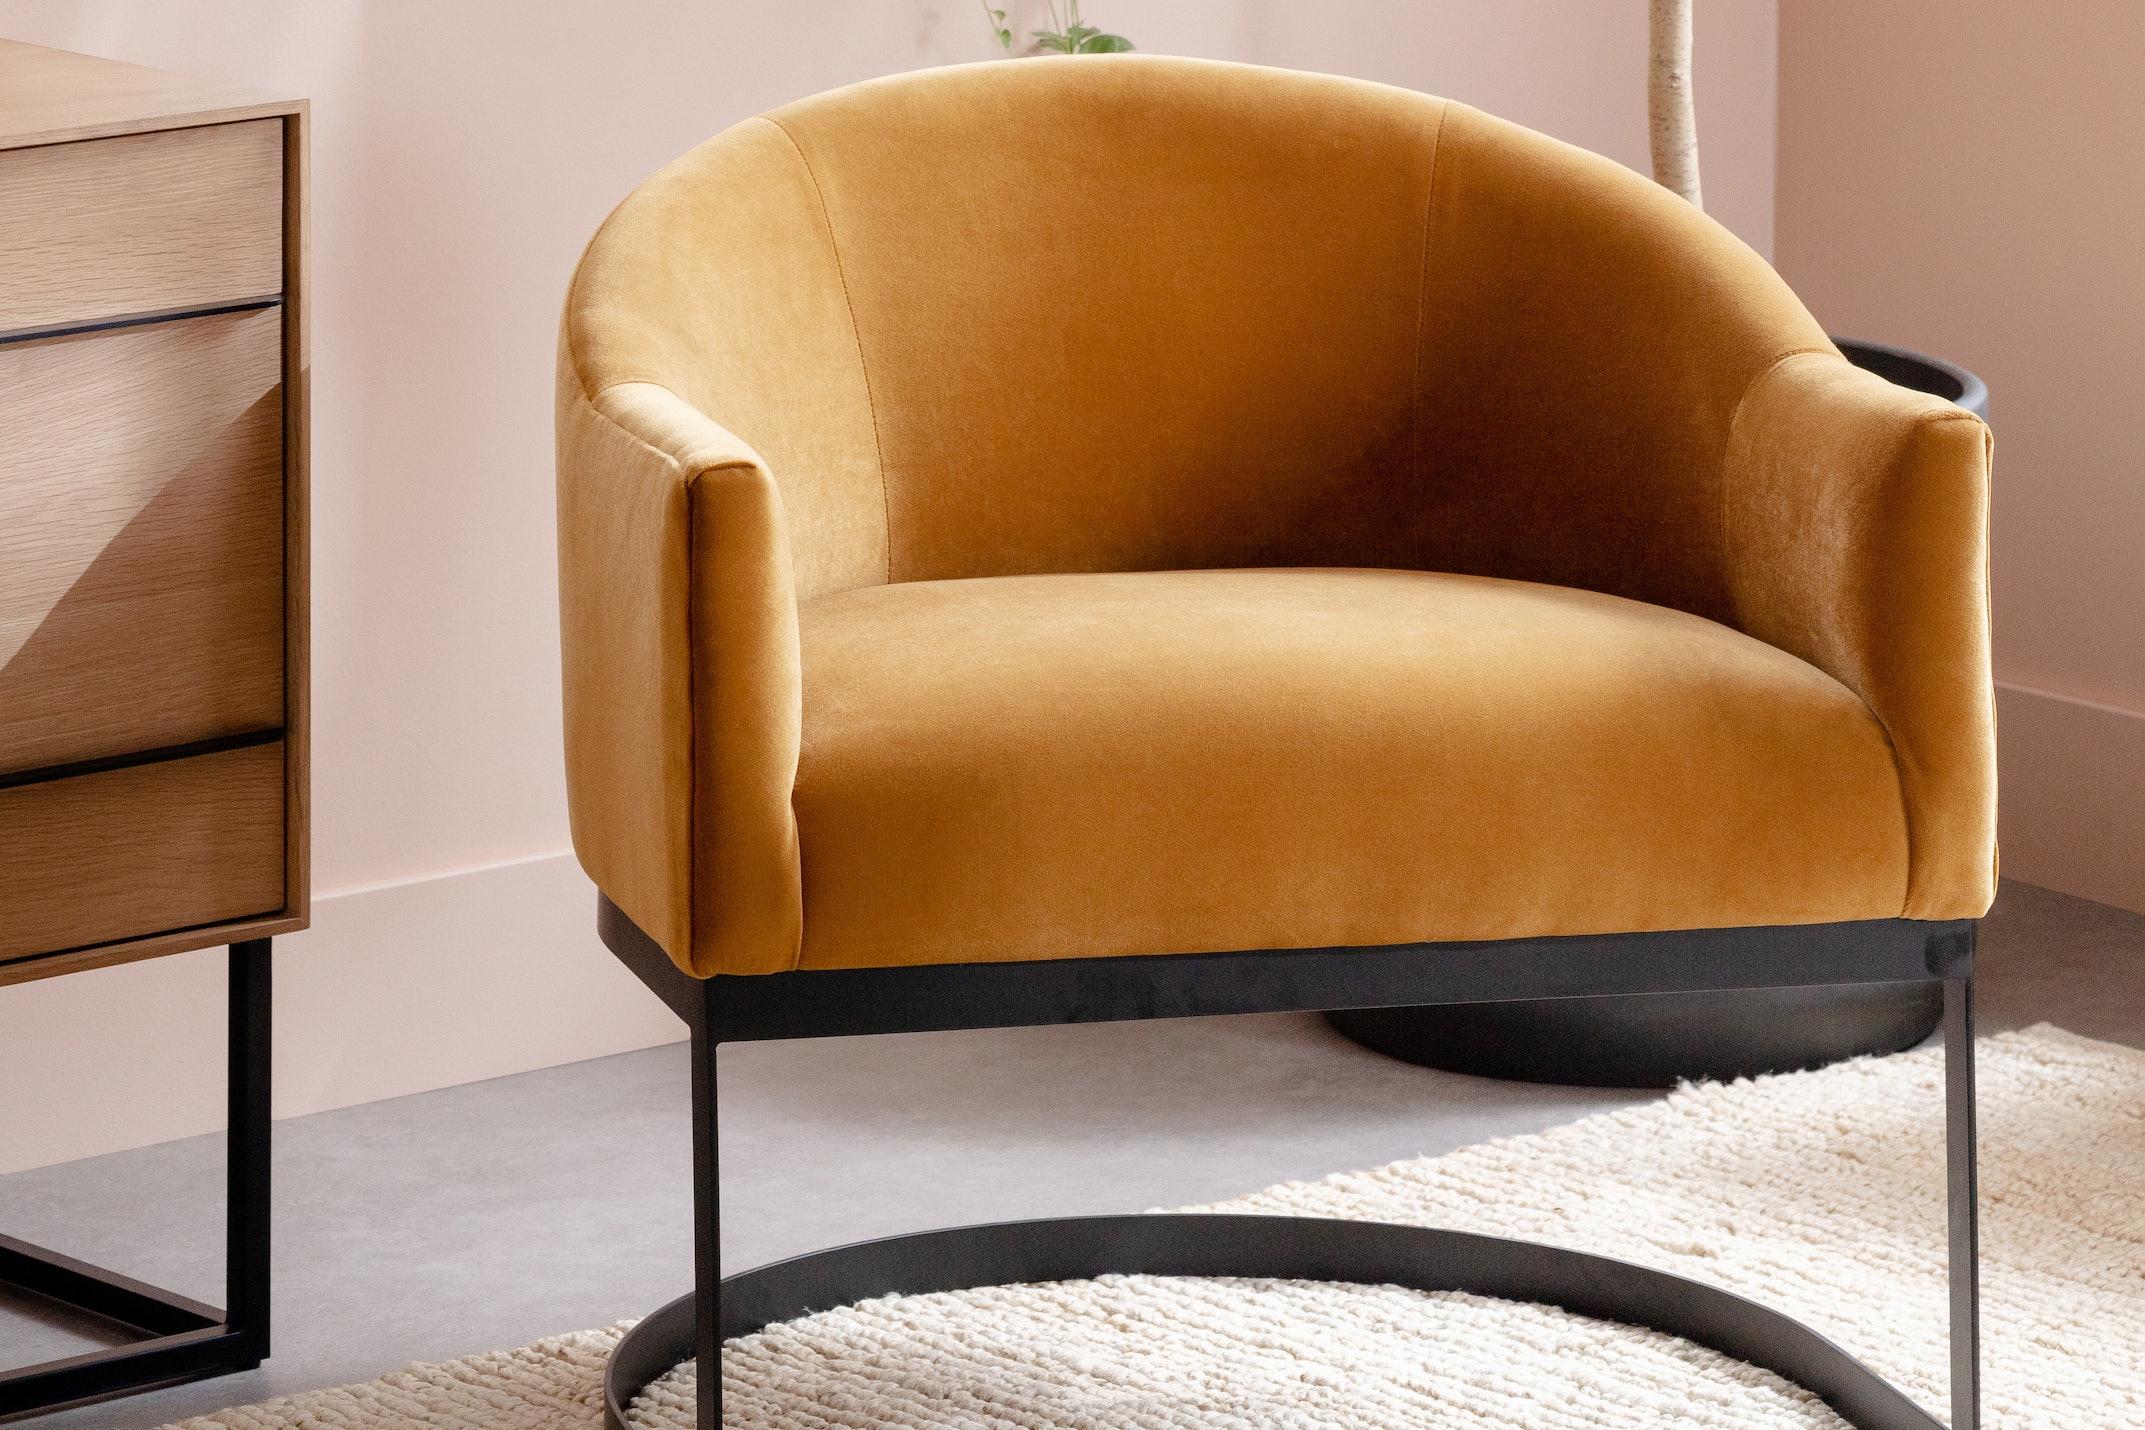 Jolie chair sorrento marigold